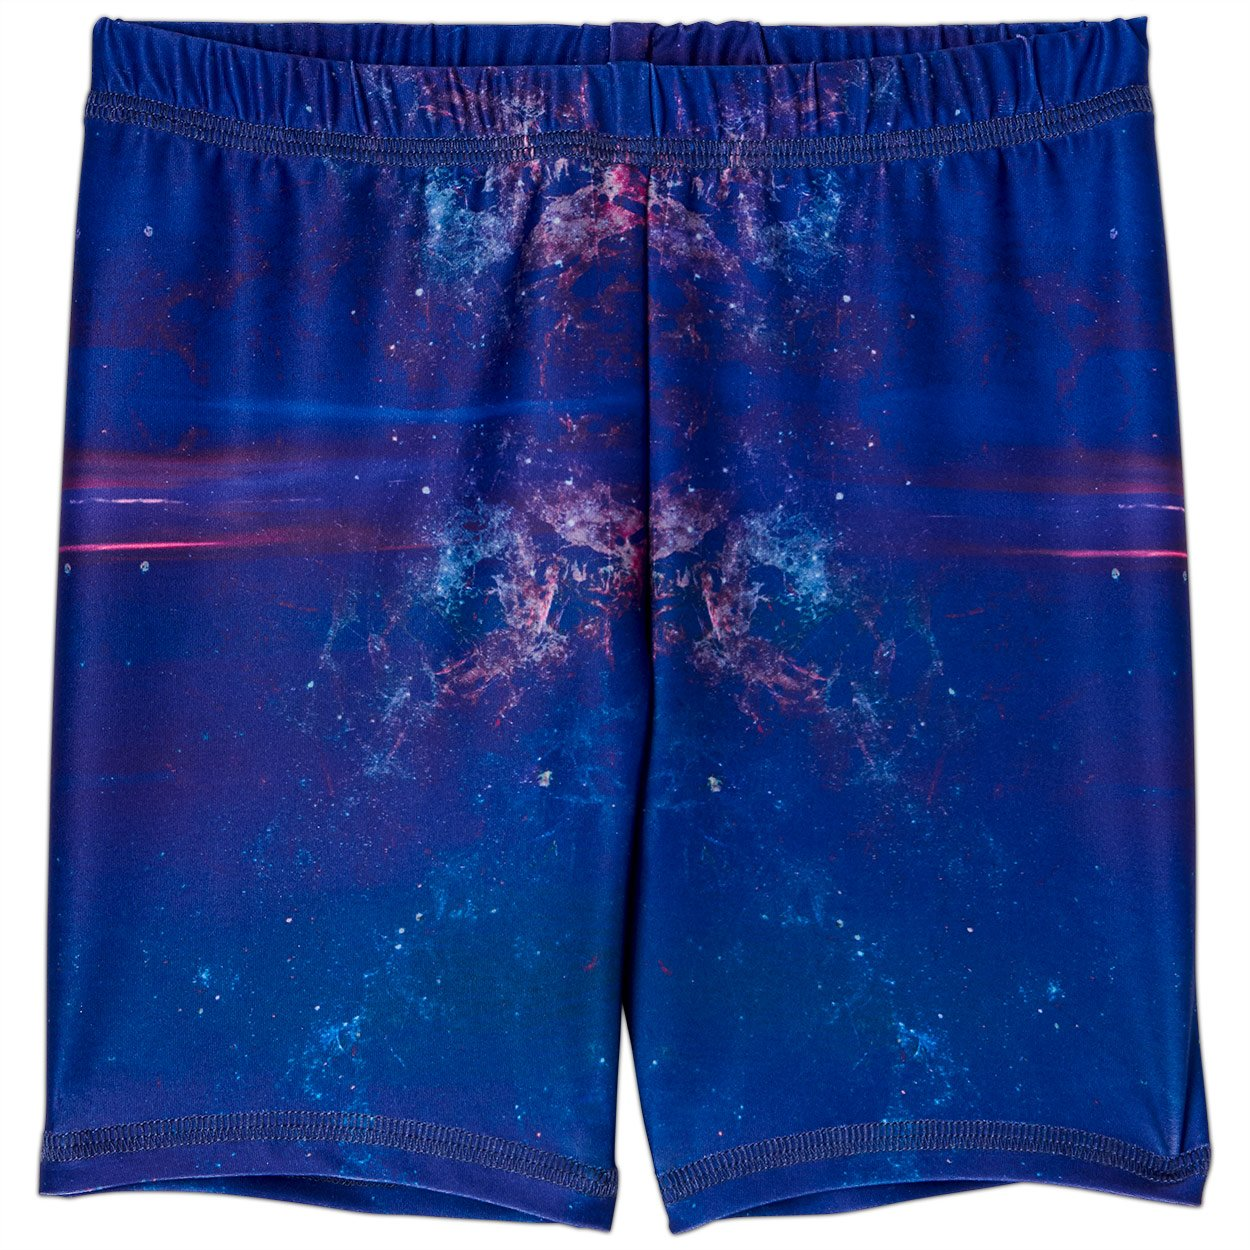 Cosmos Sunblocker Shorts UPF 50+